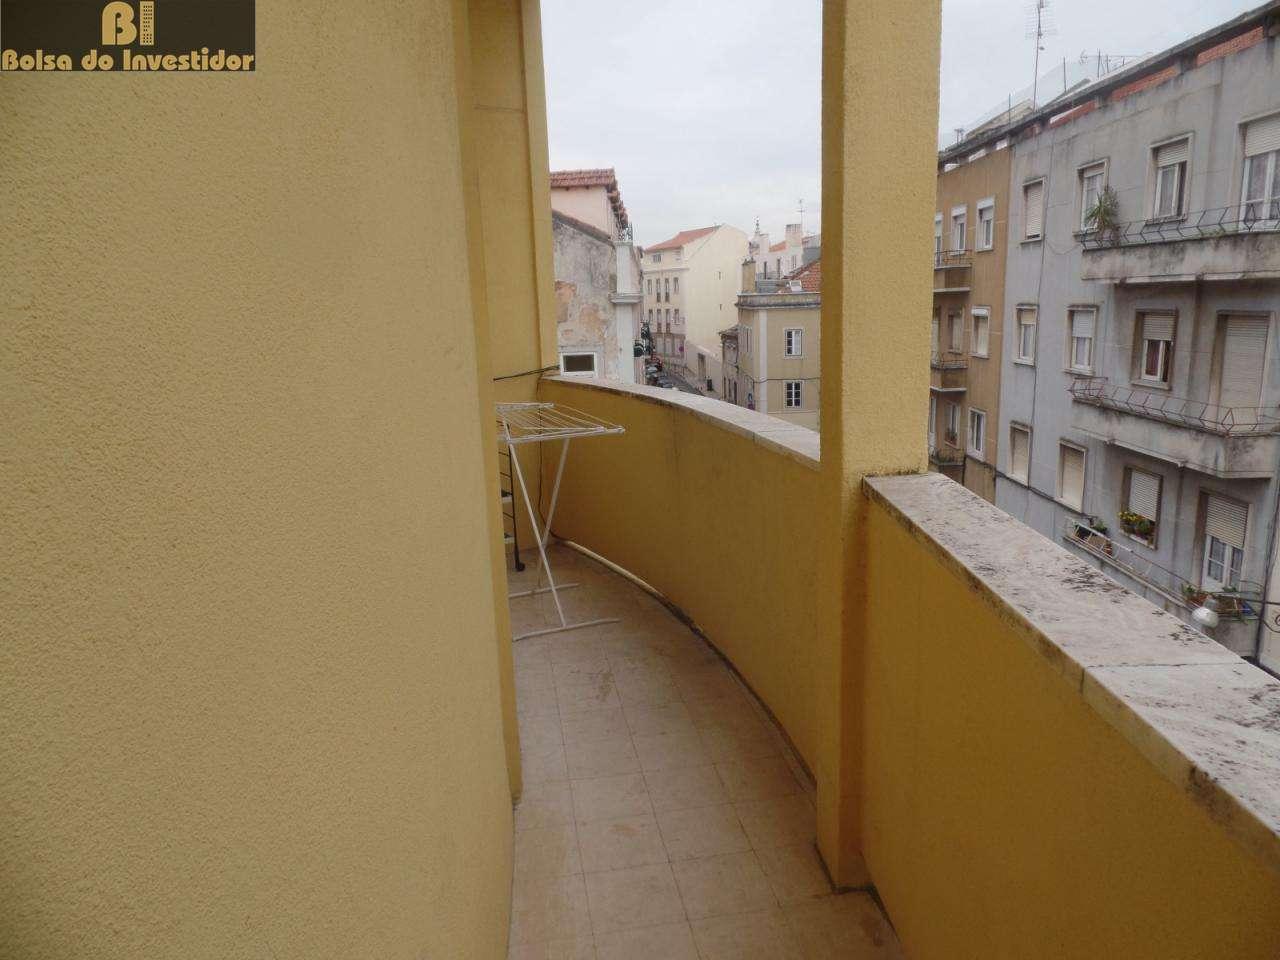 Prédio para comprar, Carnide, Lisboa - Foto 10